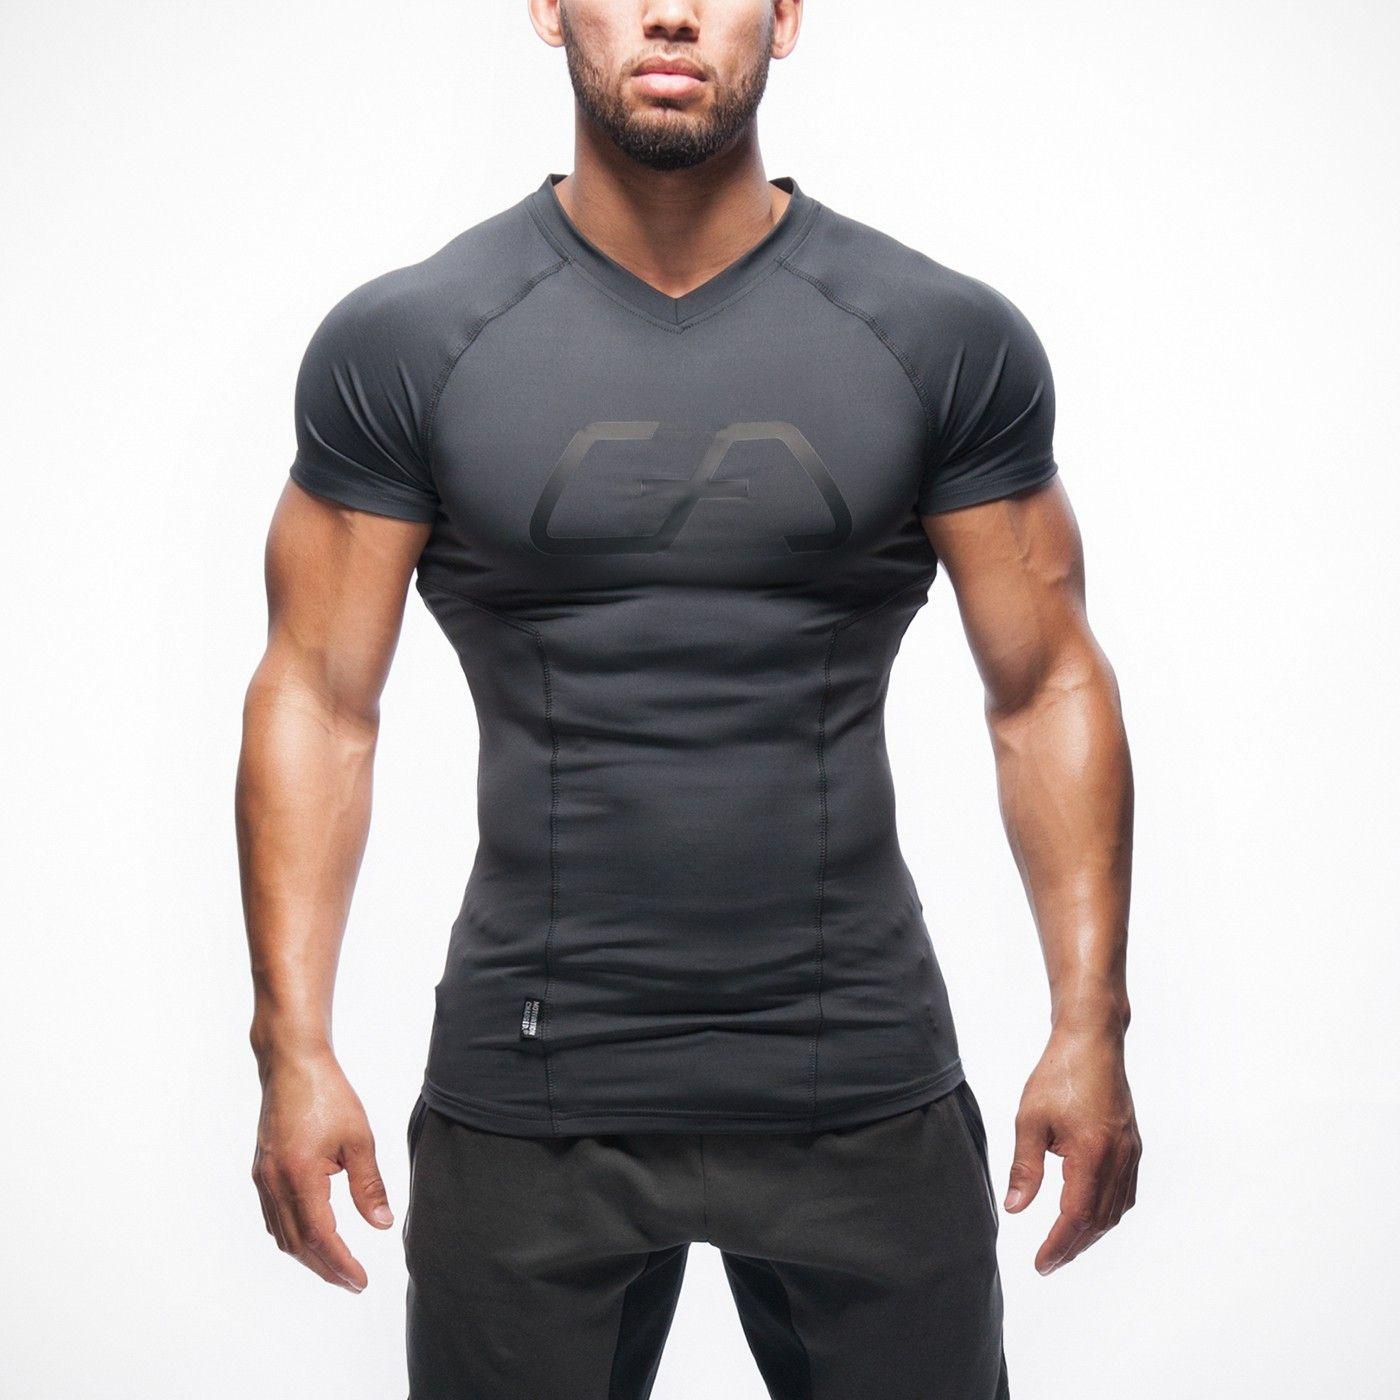 Sport & Unterhaltung Lauf T Hemd Männer T-shirt Punisher Gym Sport Kurzarm Mma T Captain America Superman T-shirt Fitness Kompression Shirt Attraktive Designs; Sportbekleidung